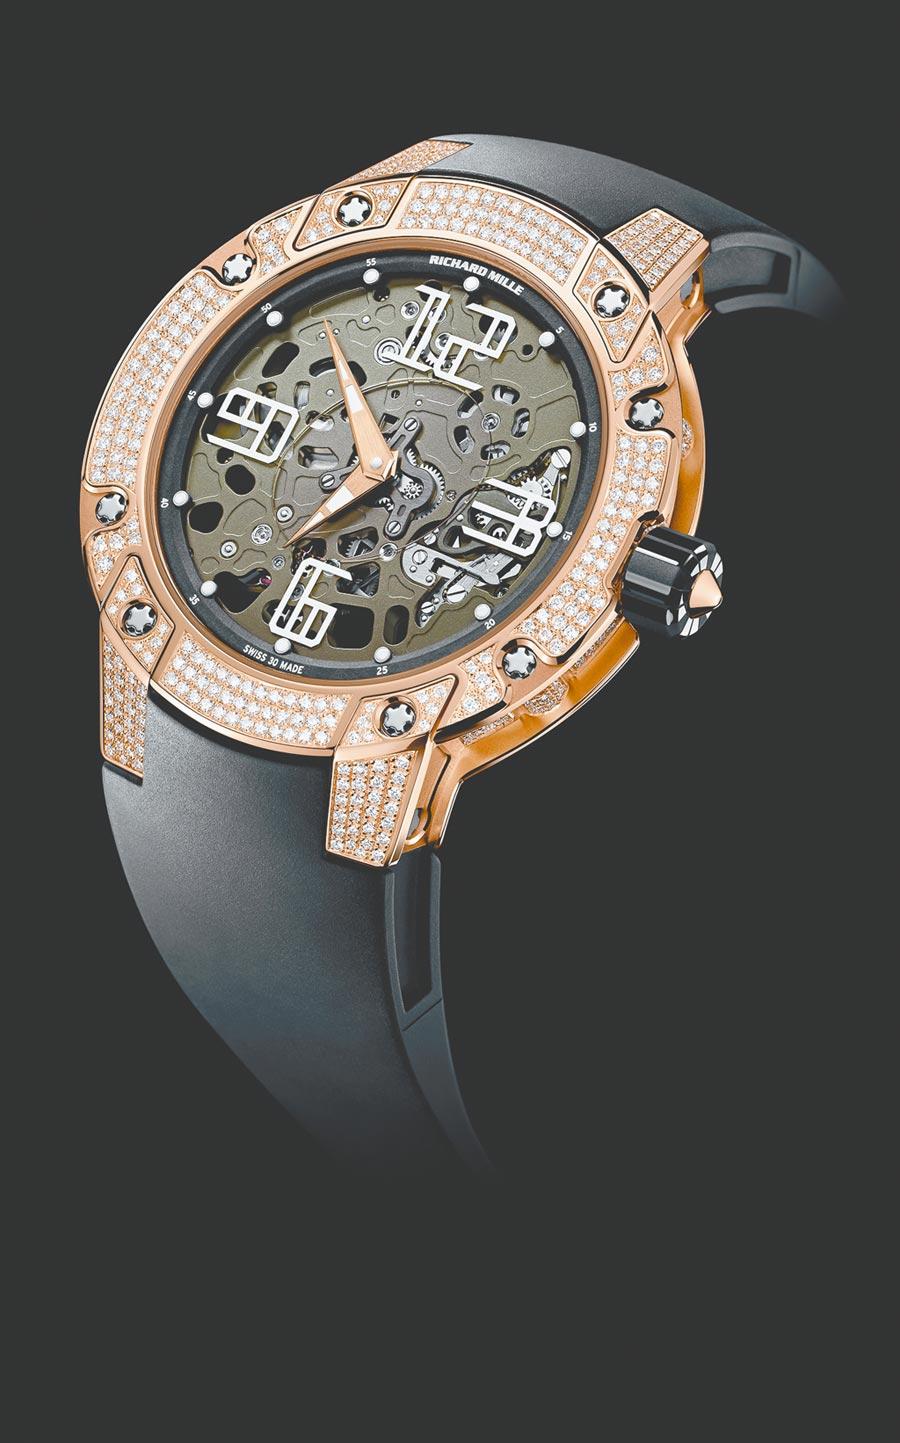 RICHARD MILLE於2011年打造RM 033腕表,圓融又不減個性。(RICHARD MILLE提供)